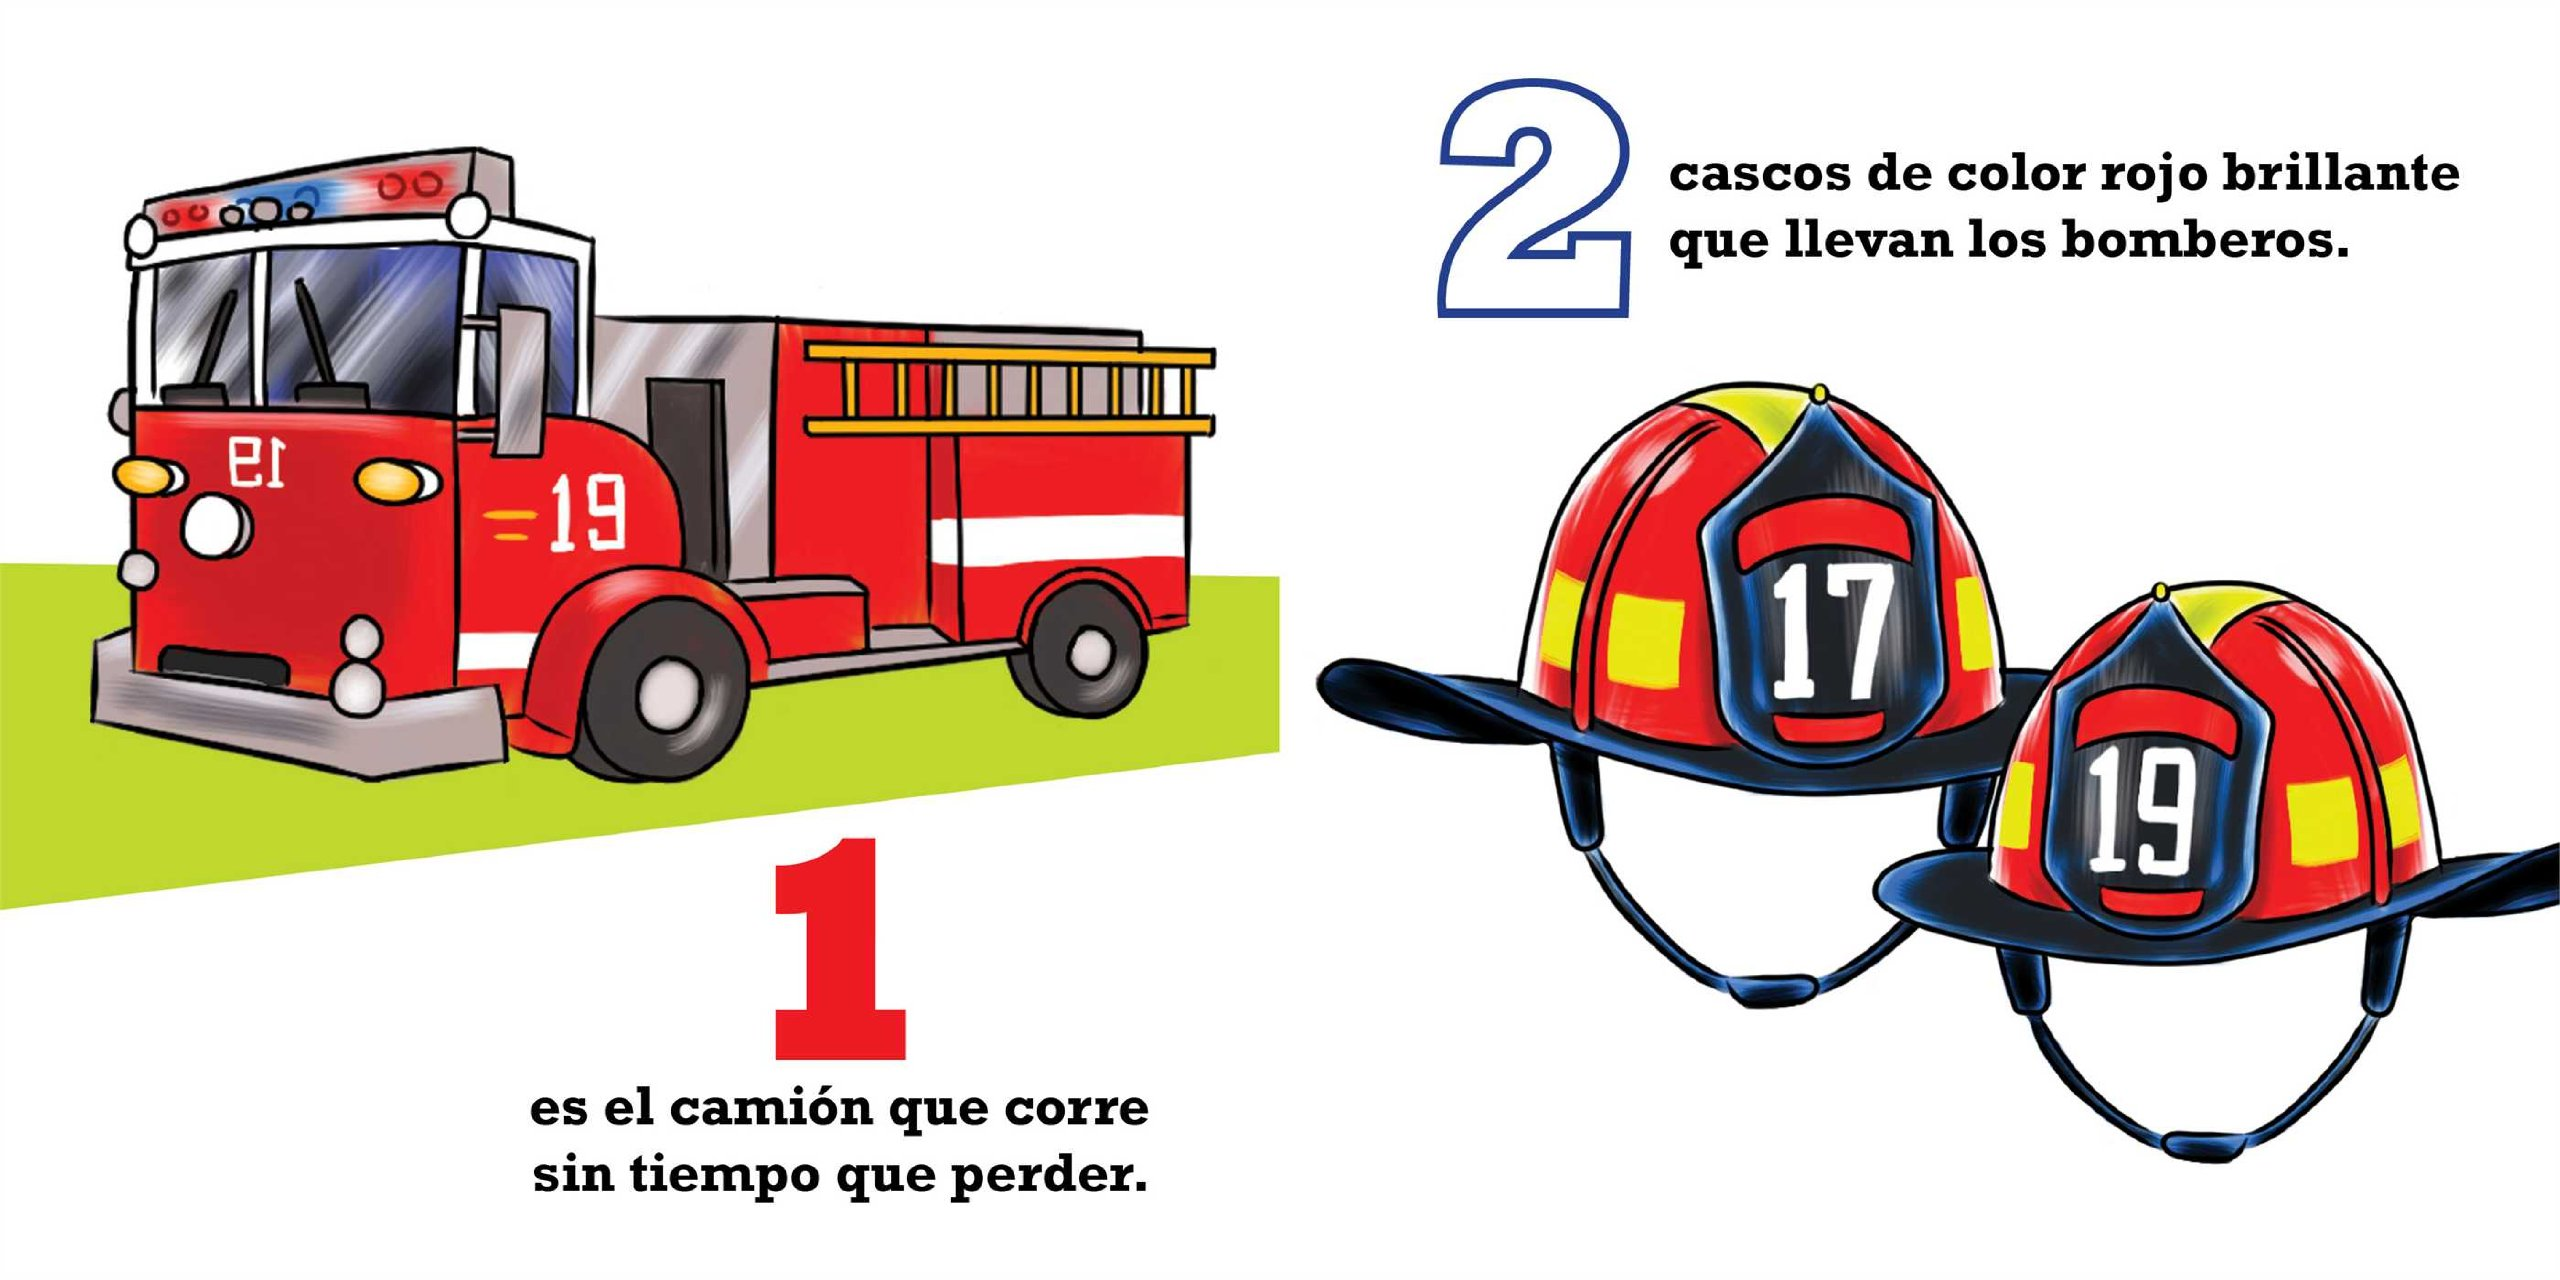 Amazon.com: Mi Primer Libro De Contar: Los Bomberos (Spanish Edition) (9781604334807): Cindy Entin: Books